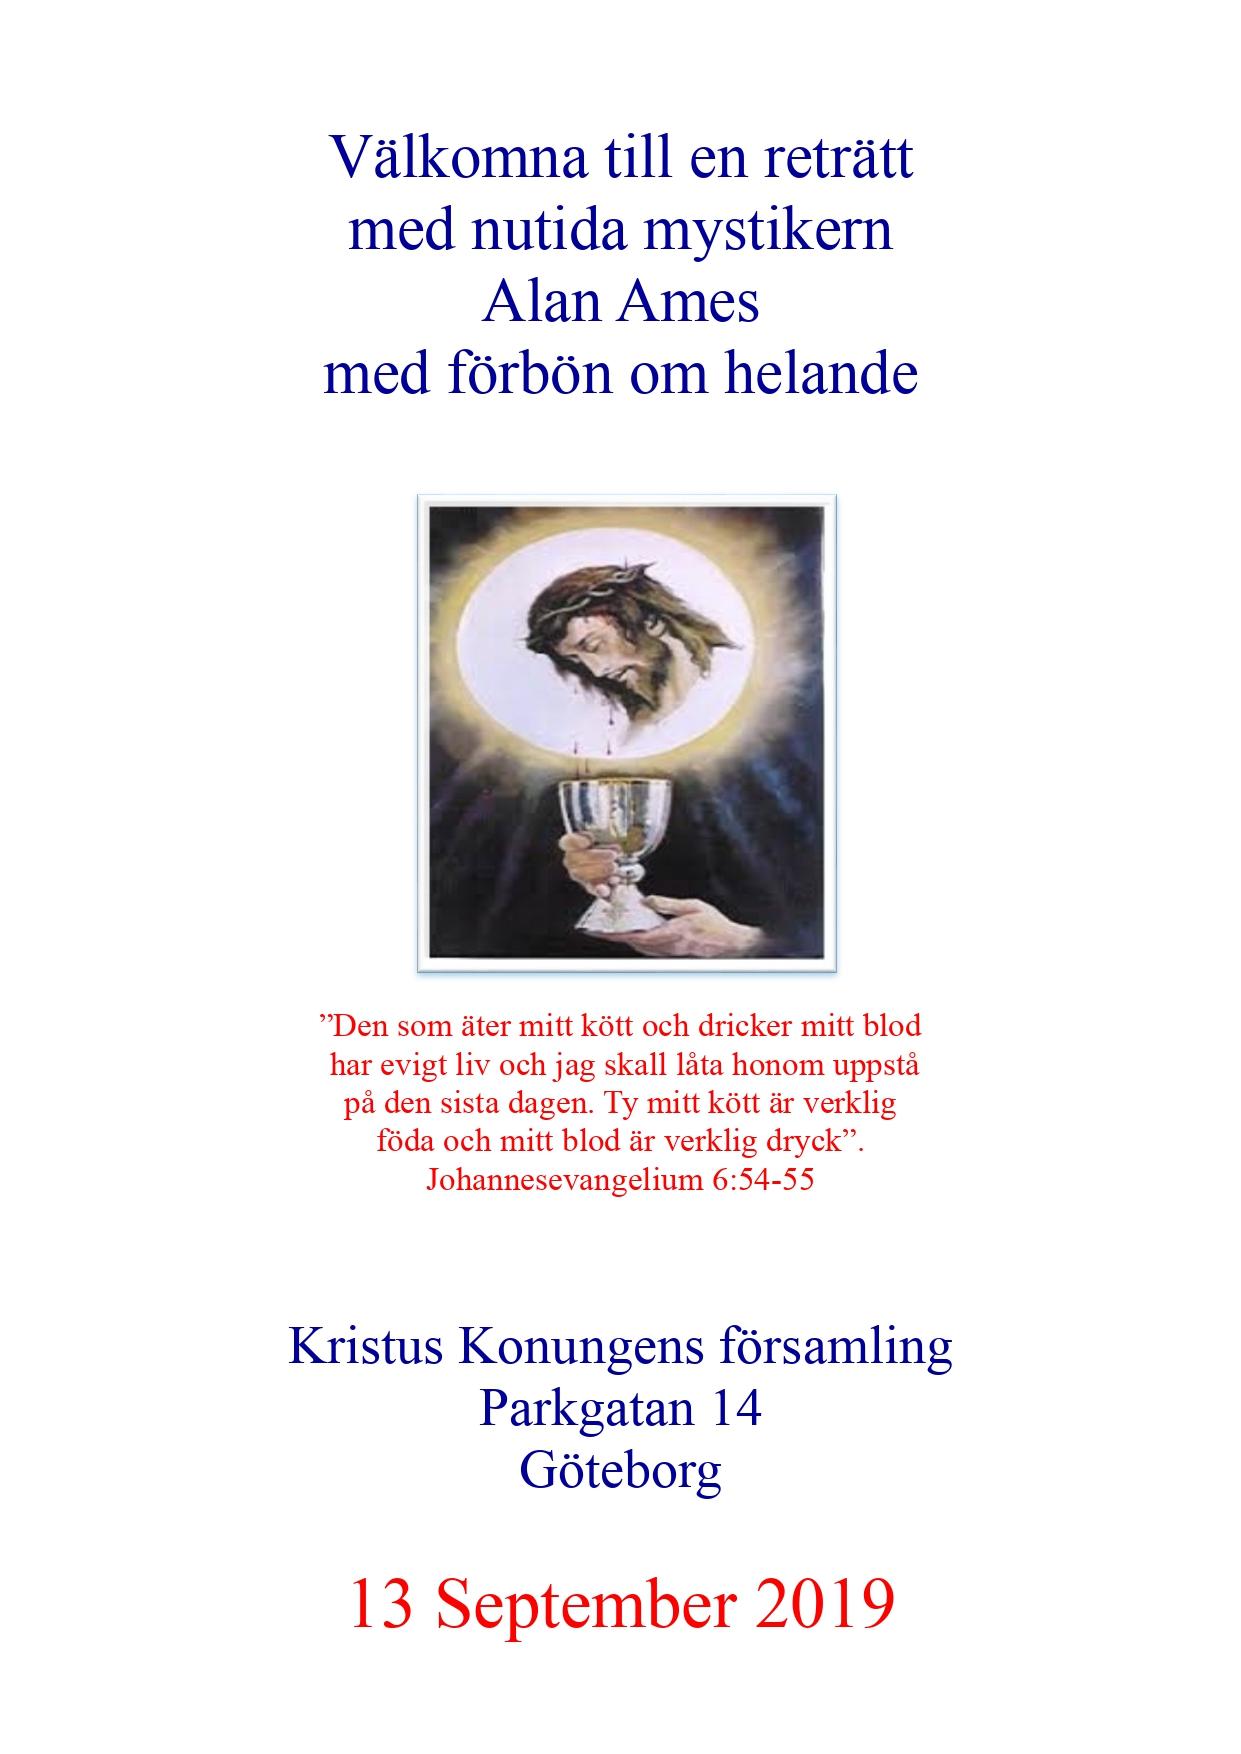 Alan Ames Göteborg   2019 nr2-1_page-0001.jpg